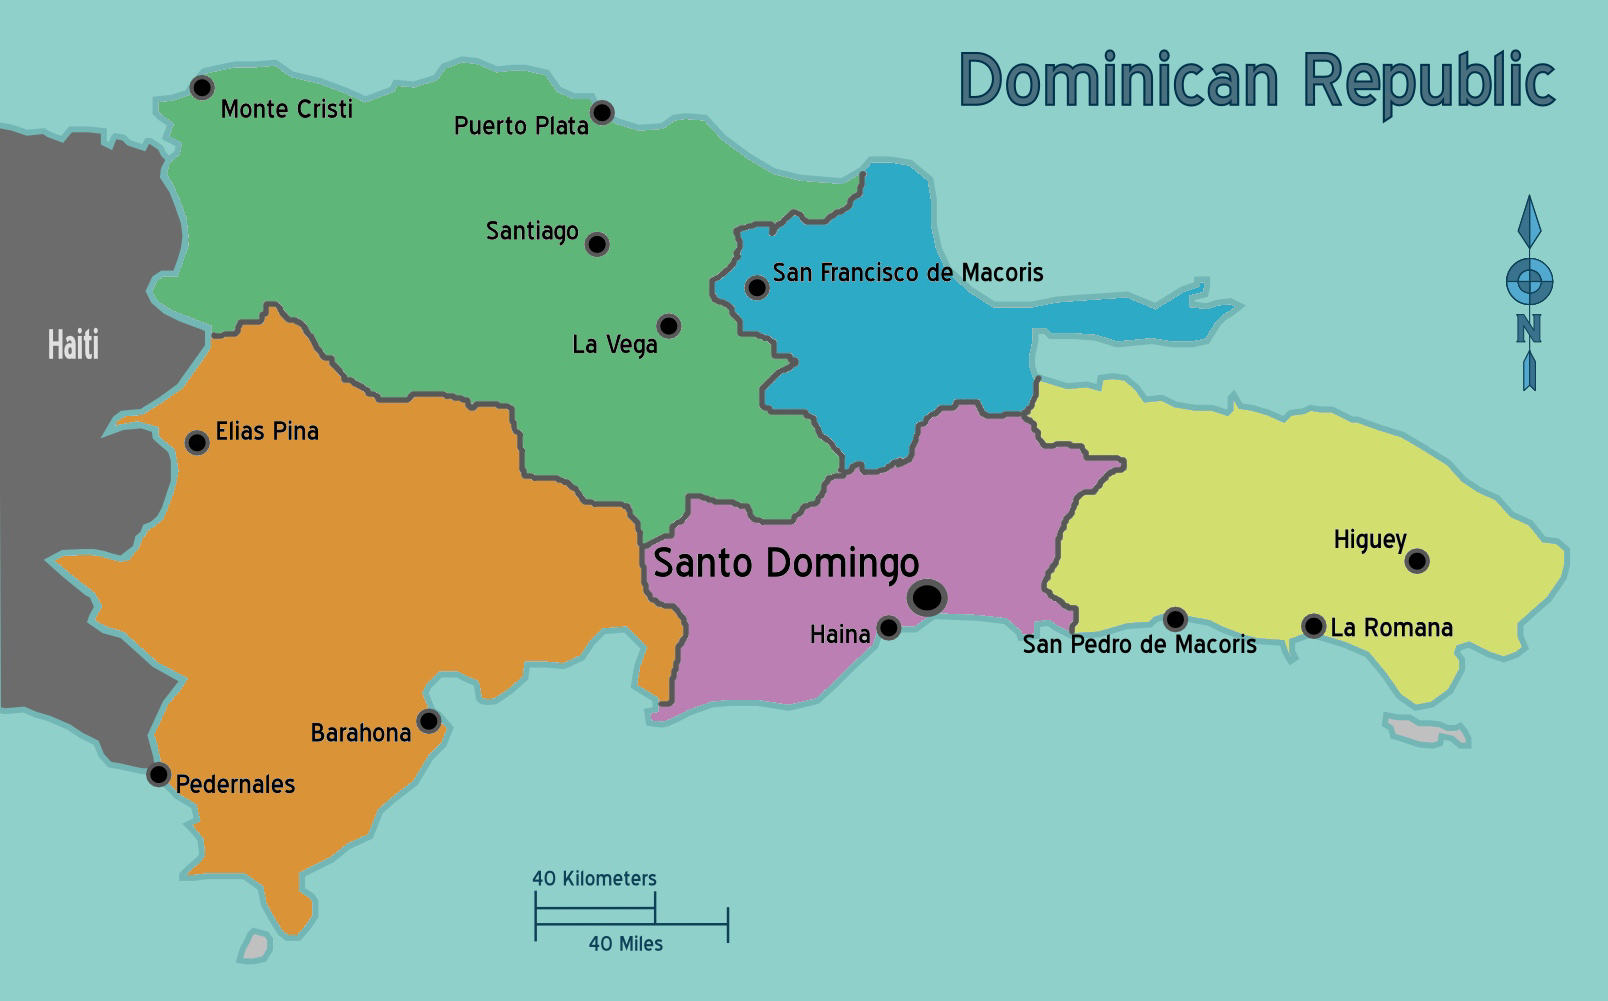 File:Dominican Republic Regions map.jpg - Wikimedia Commons